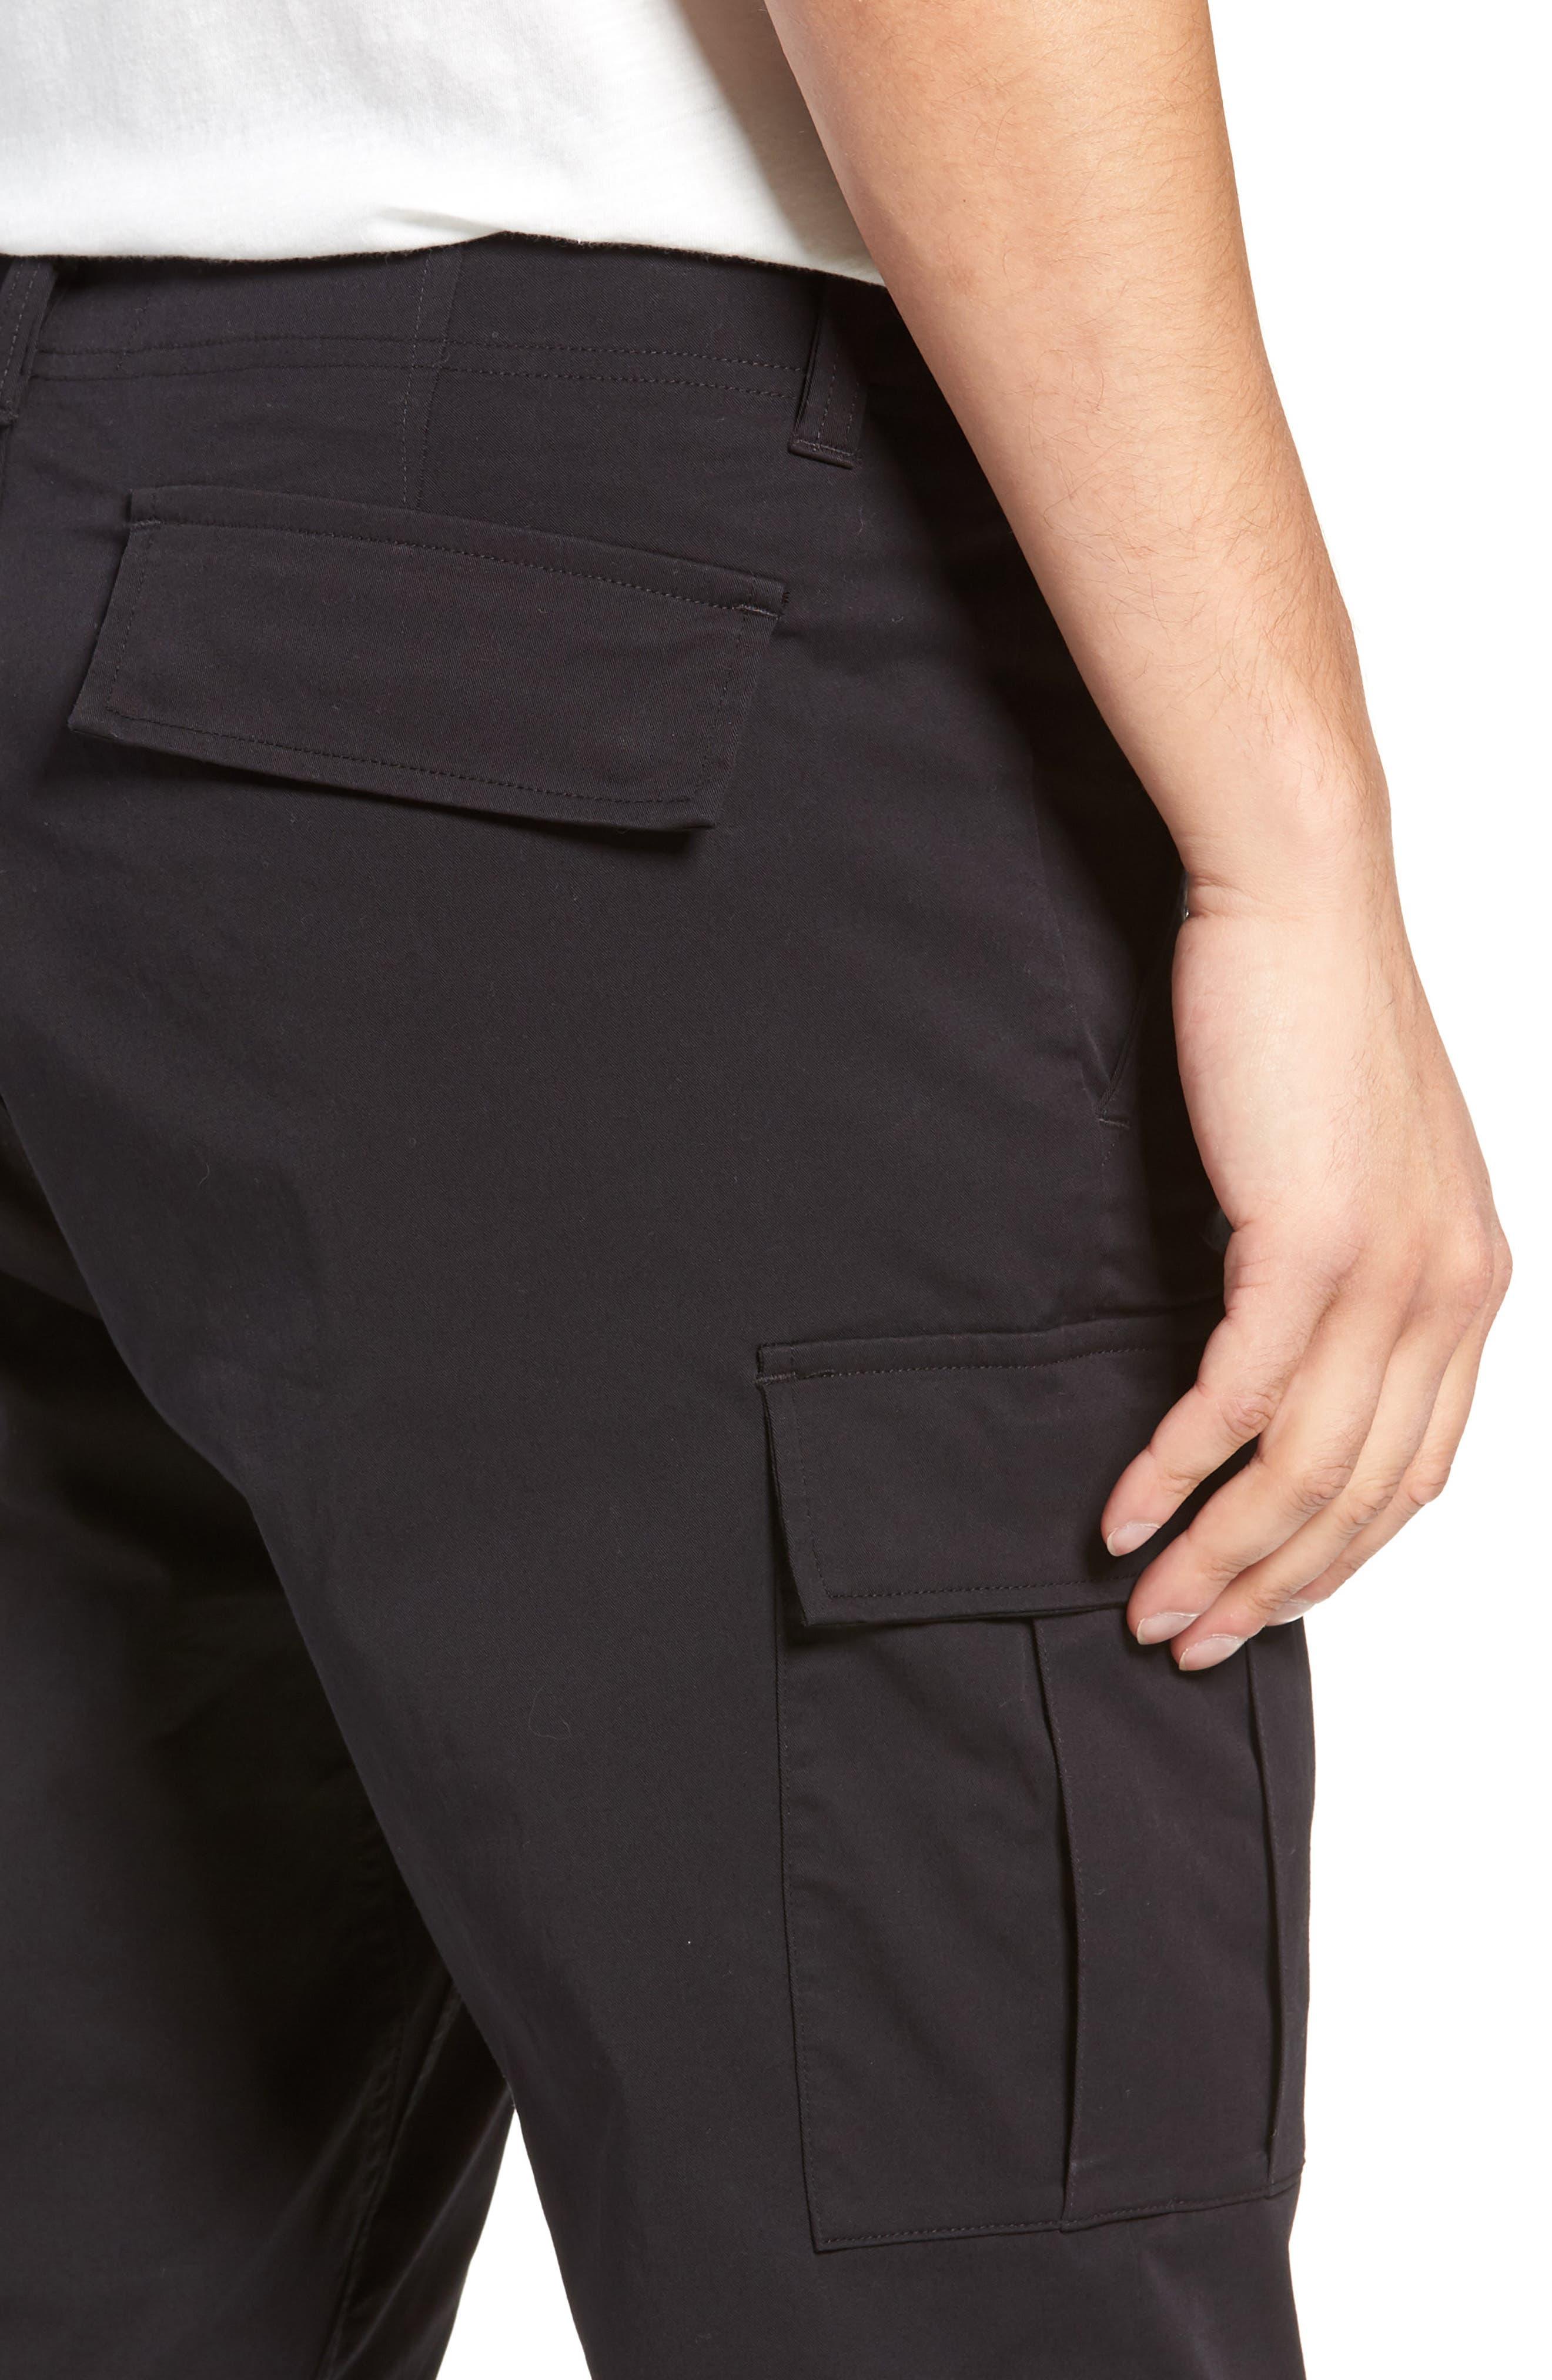 Cordura Slim Fit Cargo Pants,                             Alternate thumbnail 4, color,                             BLACK